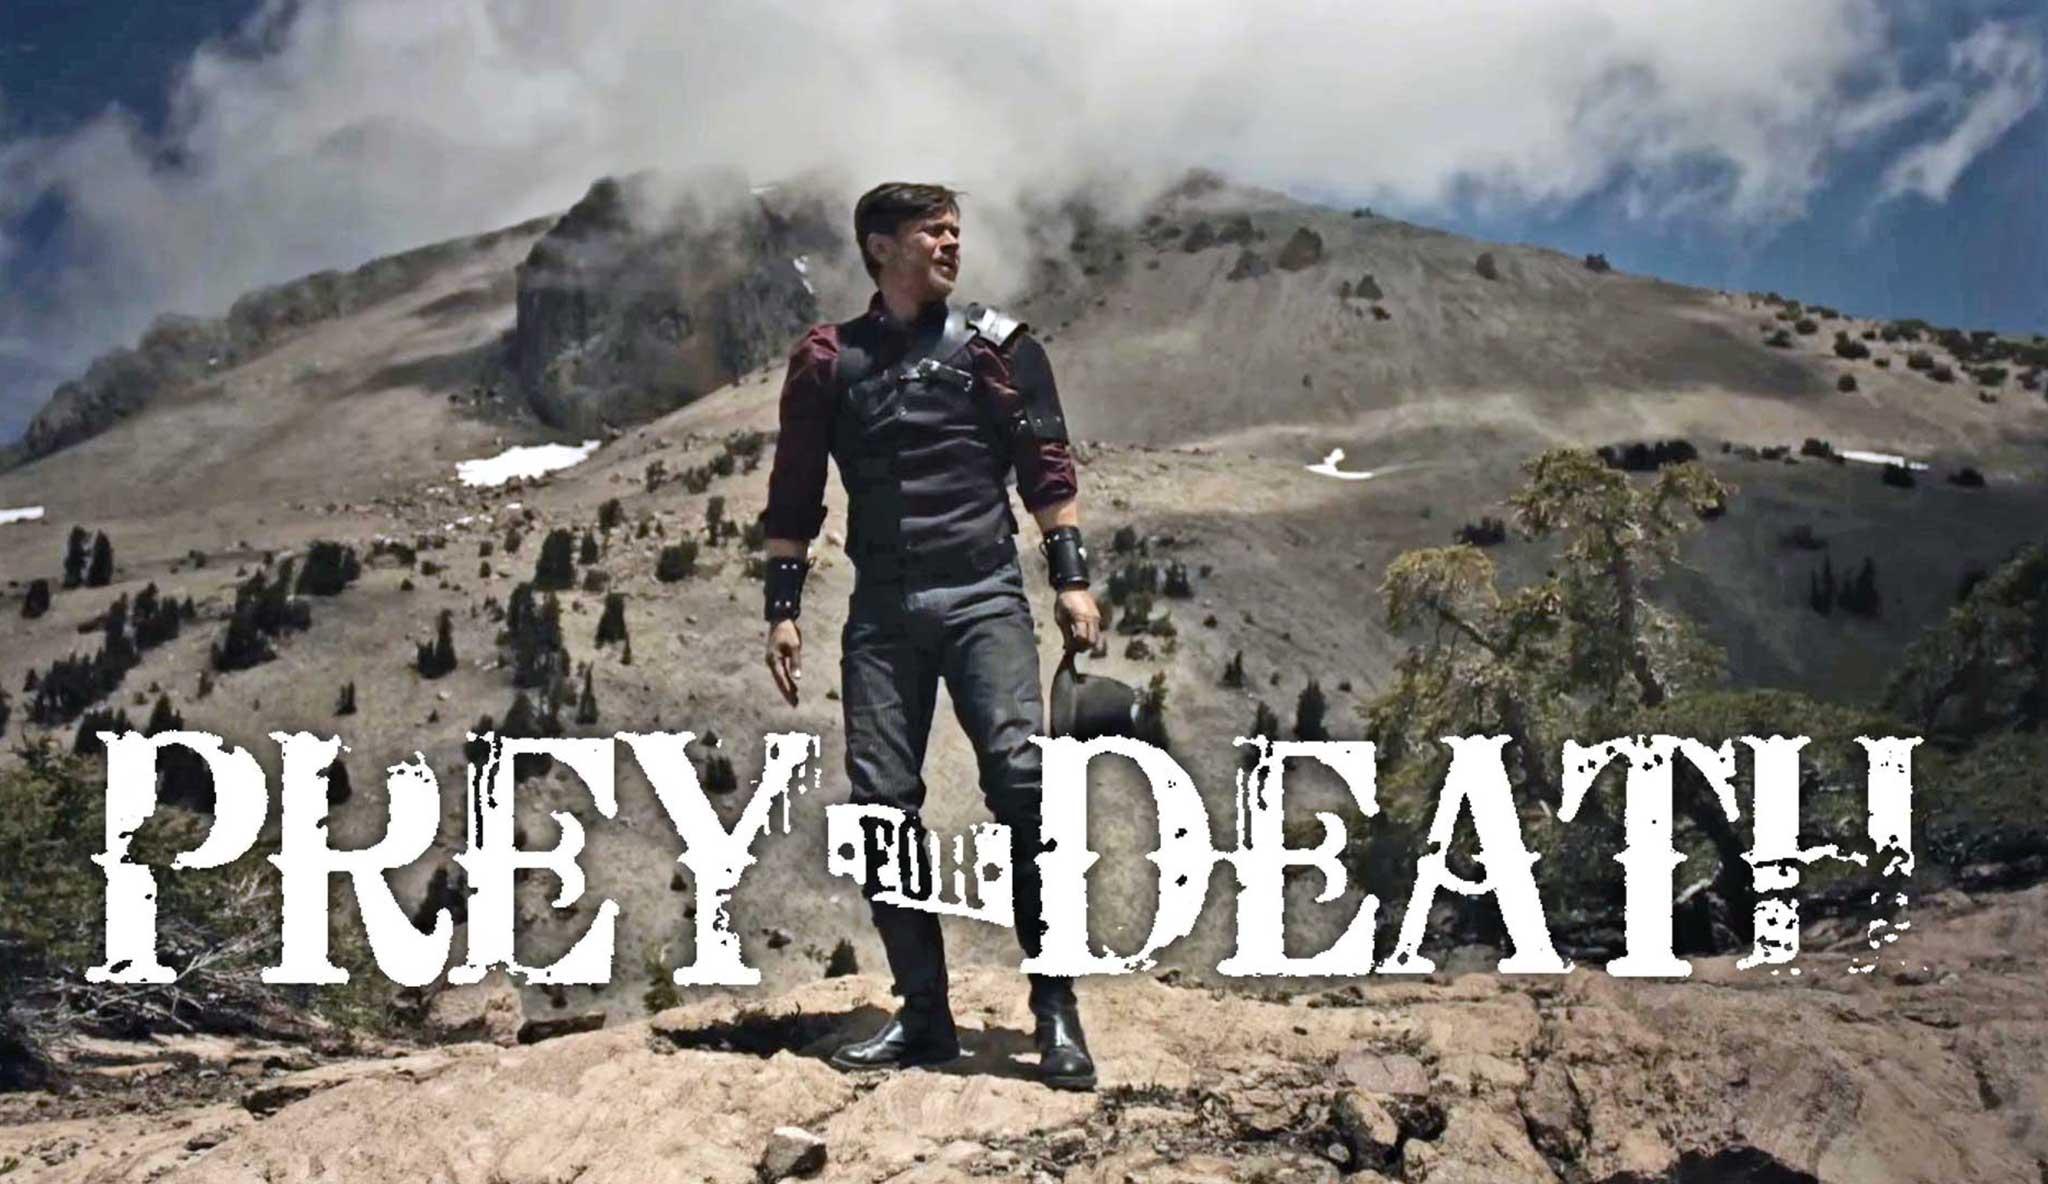 prey-for-death\header.jpg